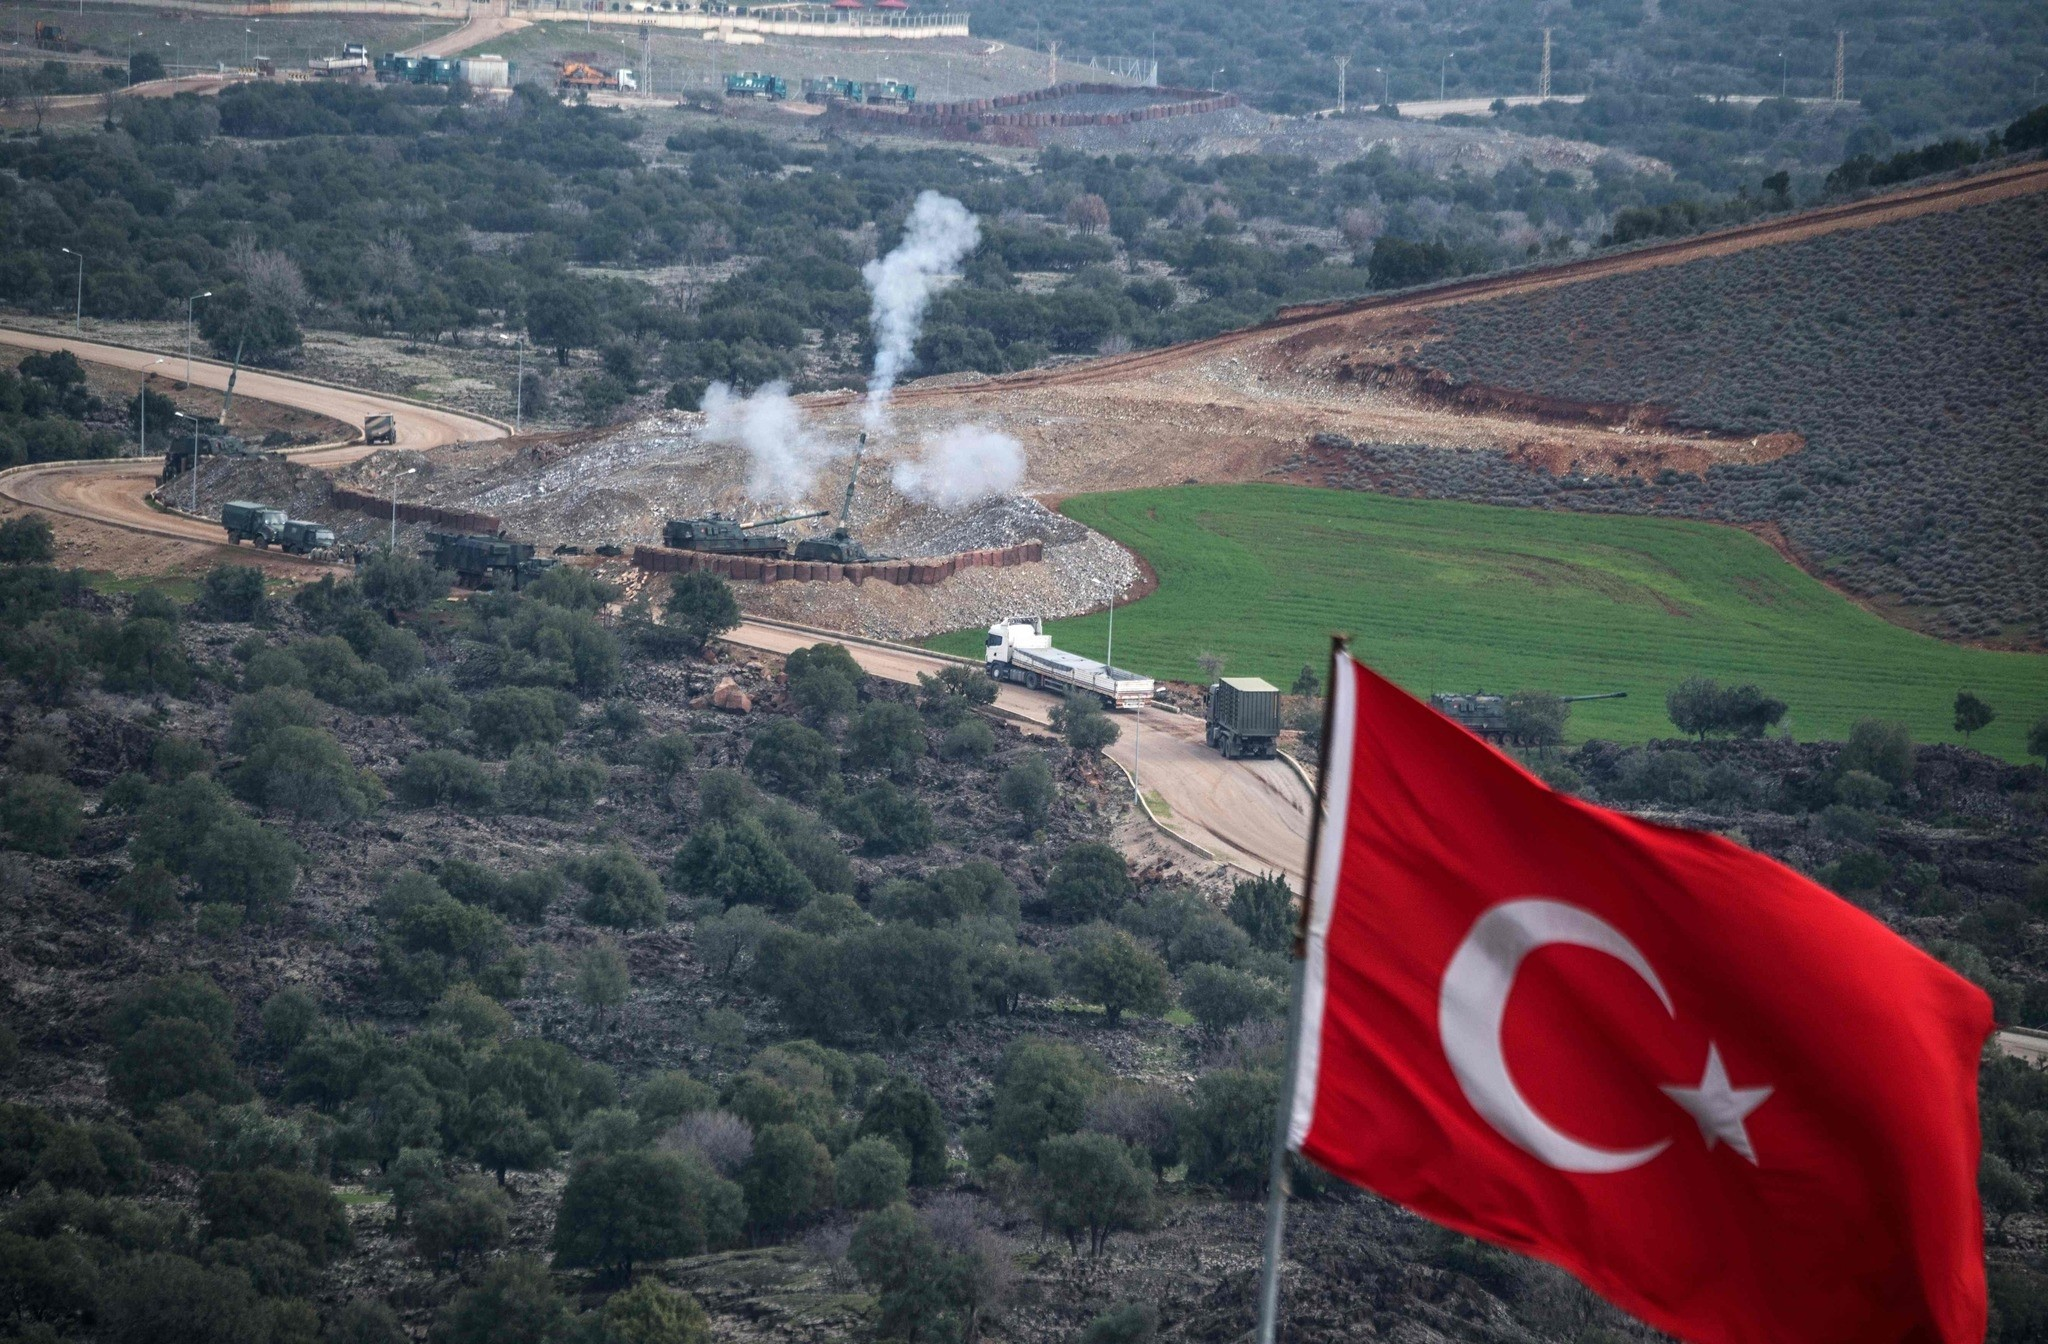 Turkish artillery shell YPG terrorist positions near the Syrian border as part of the Afrin offensive, Hatay, Turkey, Jan. 21.